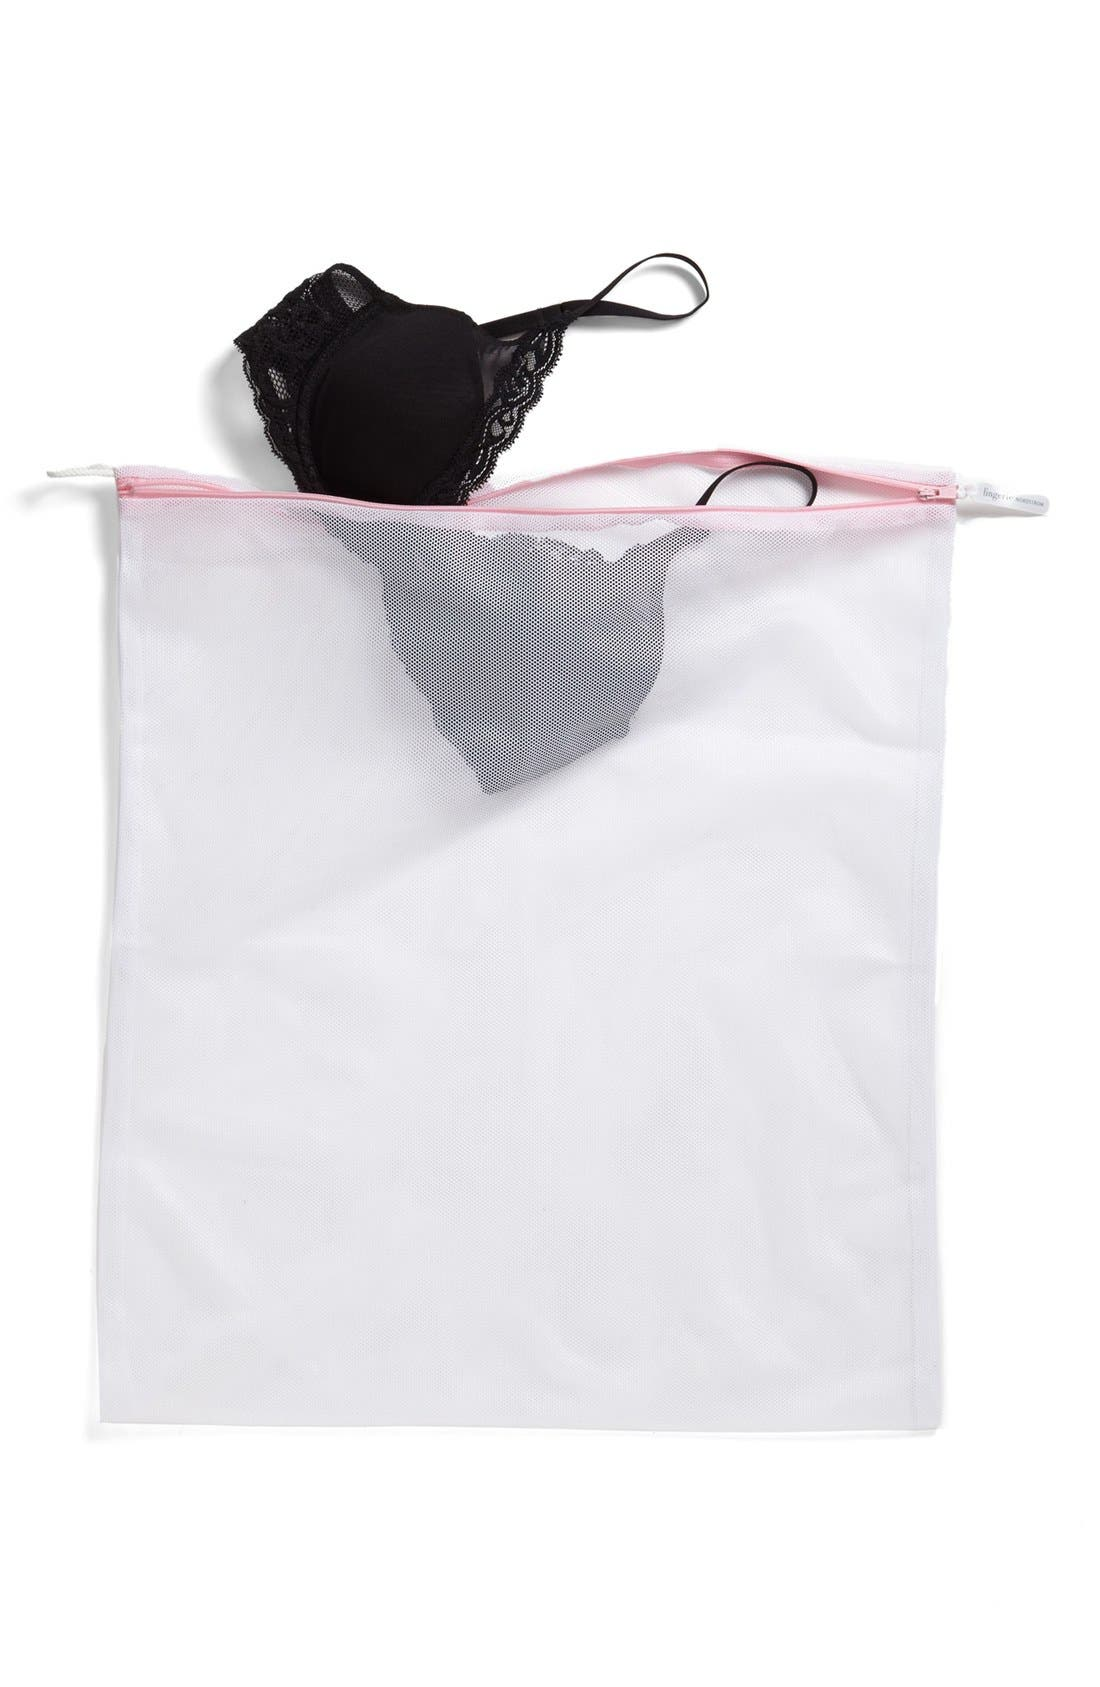 Large Lingerie Wash Bag,                             Alternate thumbnail 3, color,                             WHITE